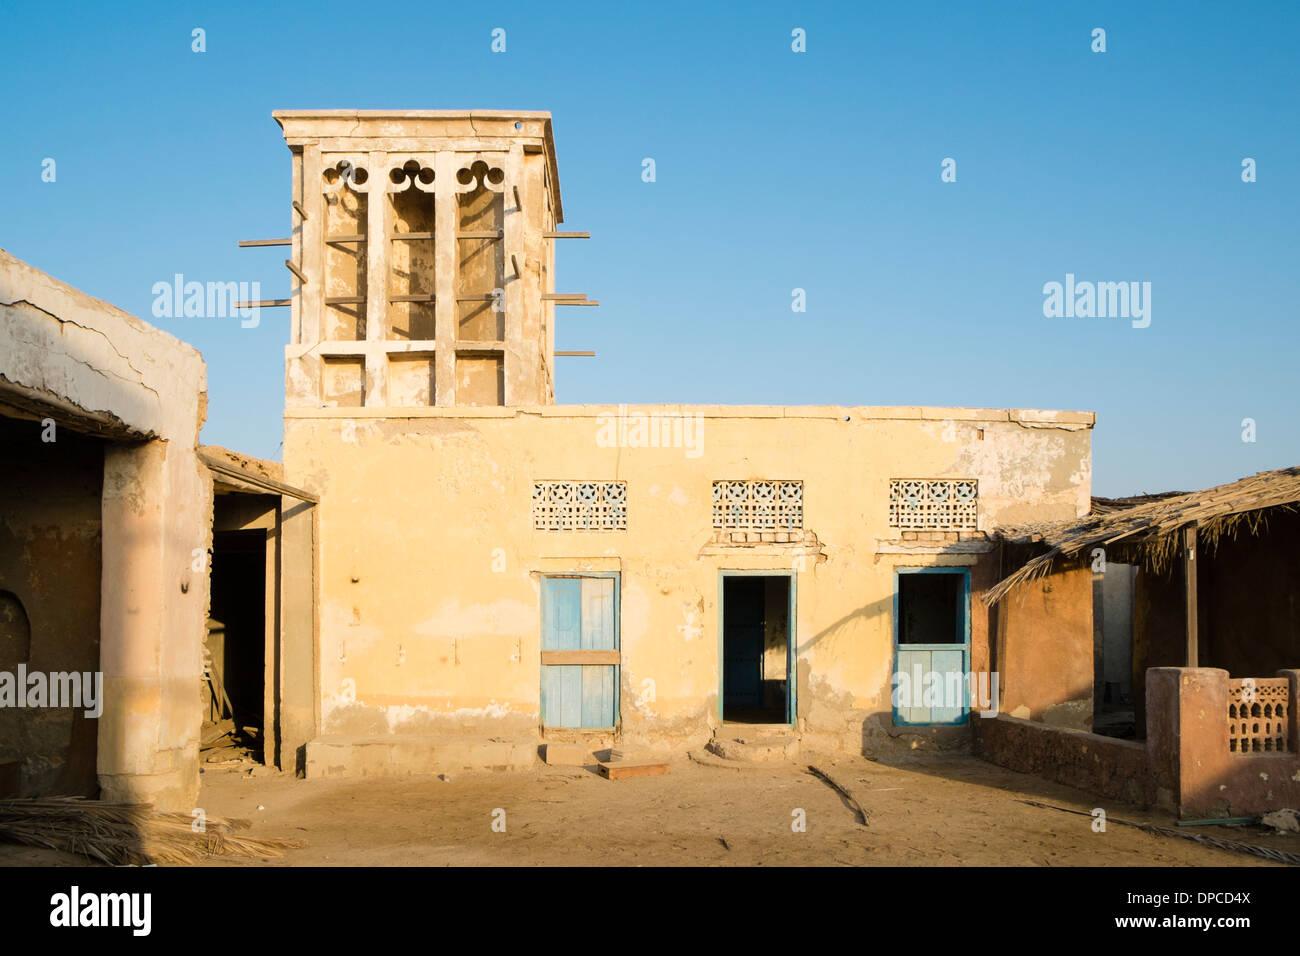 Deserted former fishing village at Jazirat Al Hamra in Ras Al Khaimah emirate in United Arab Emirates UAE - Stock Image